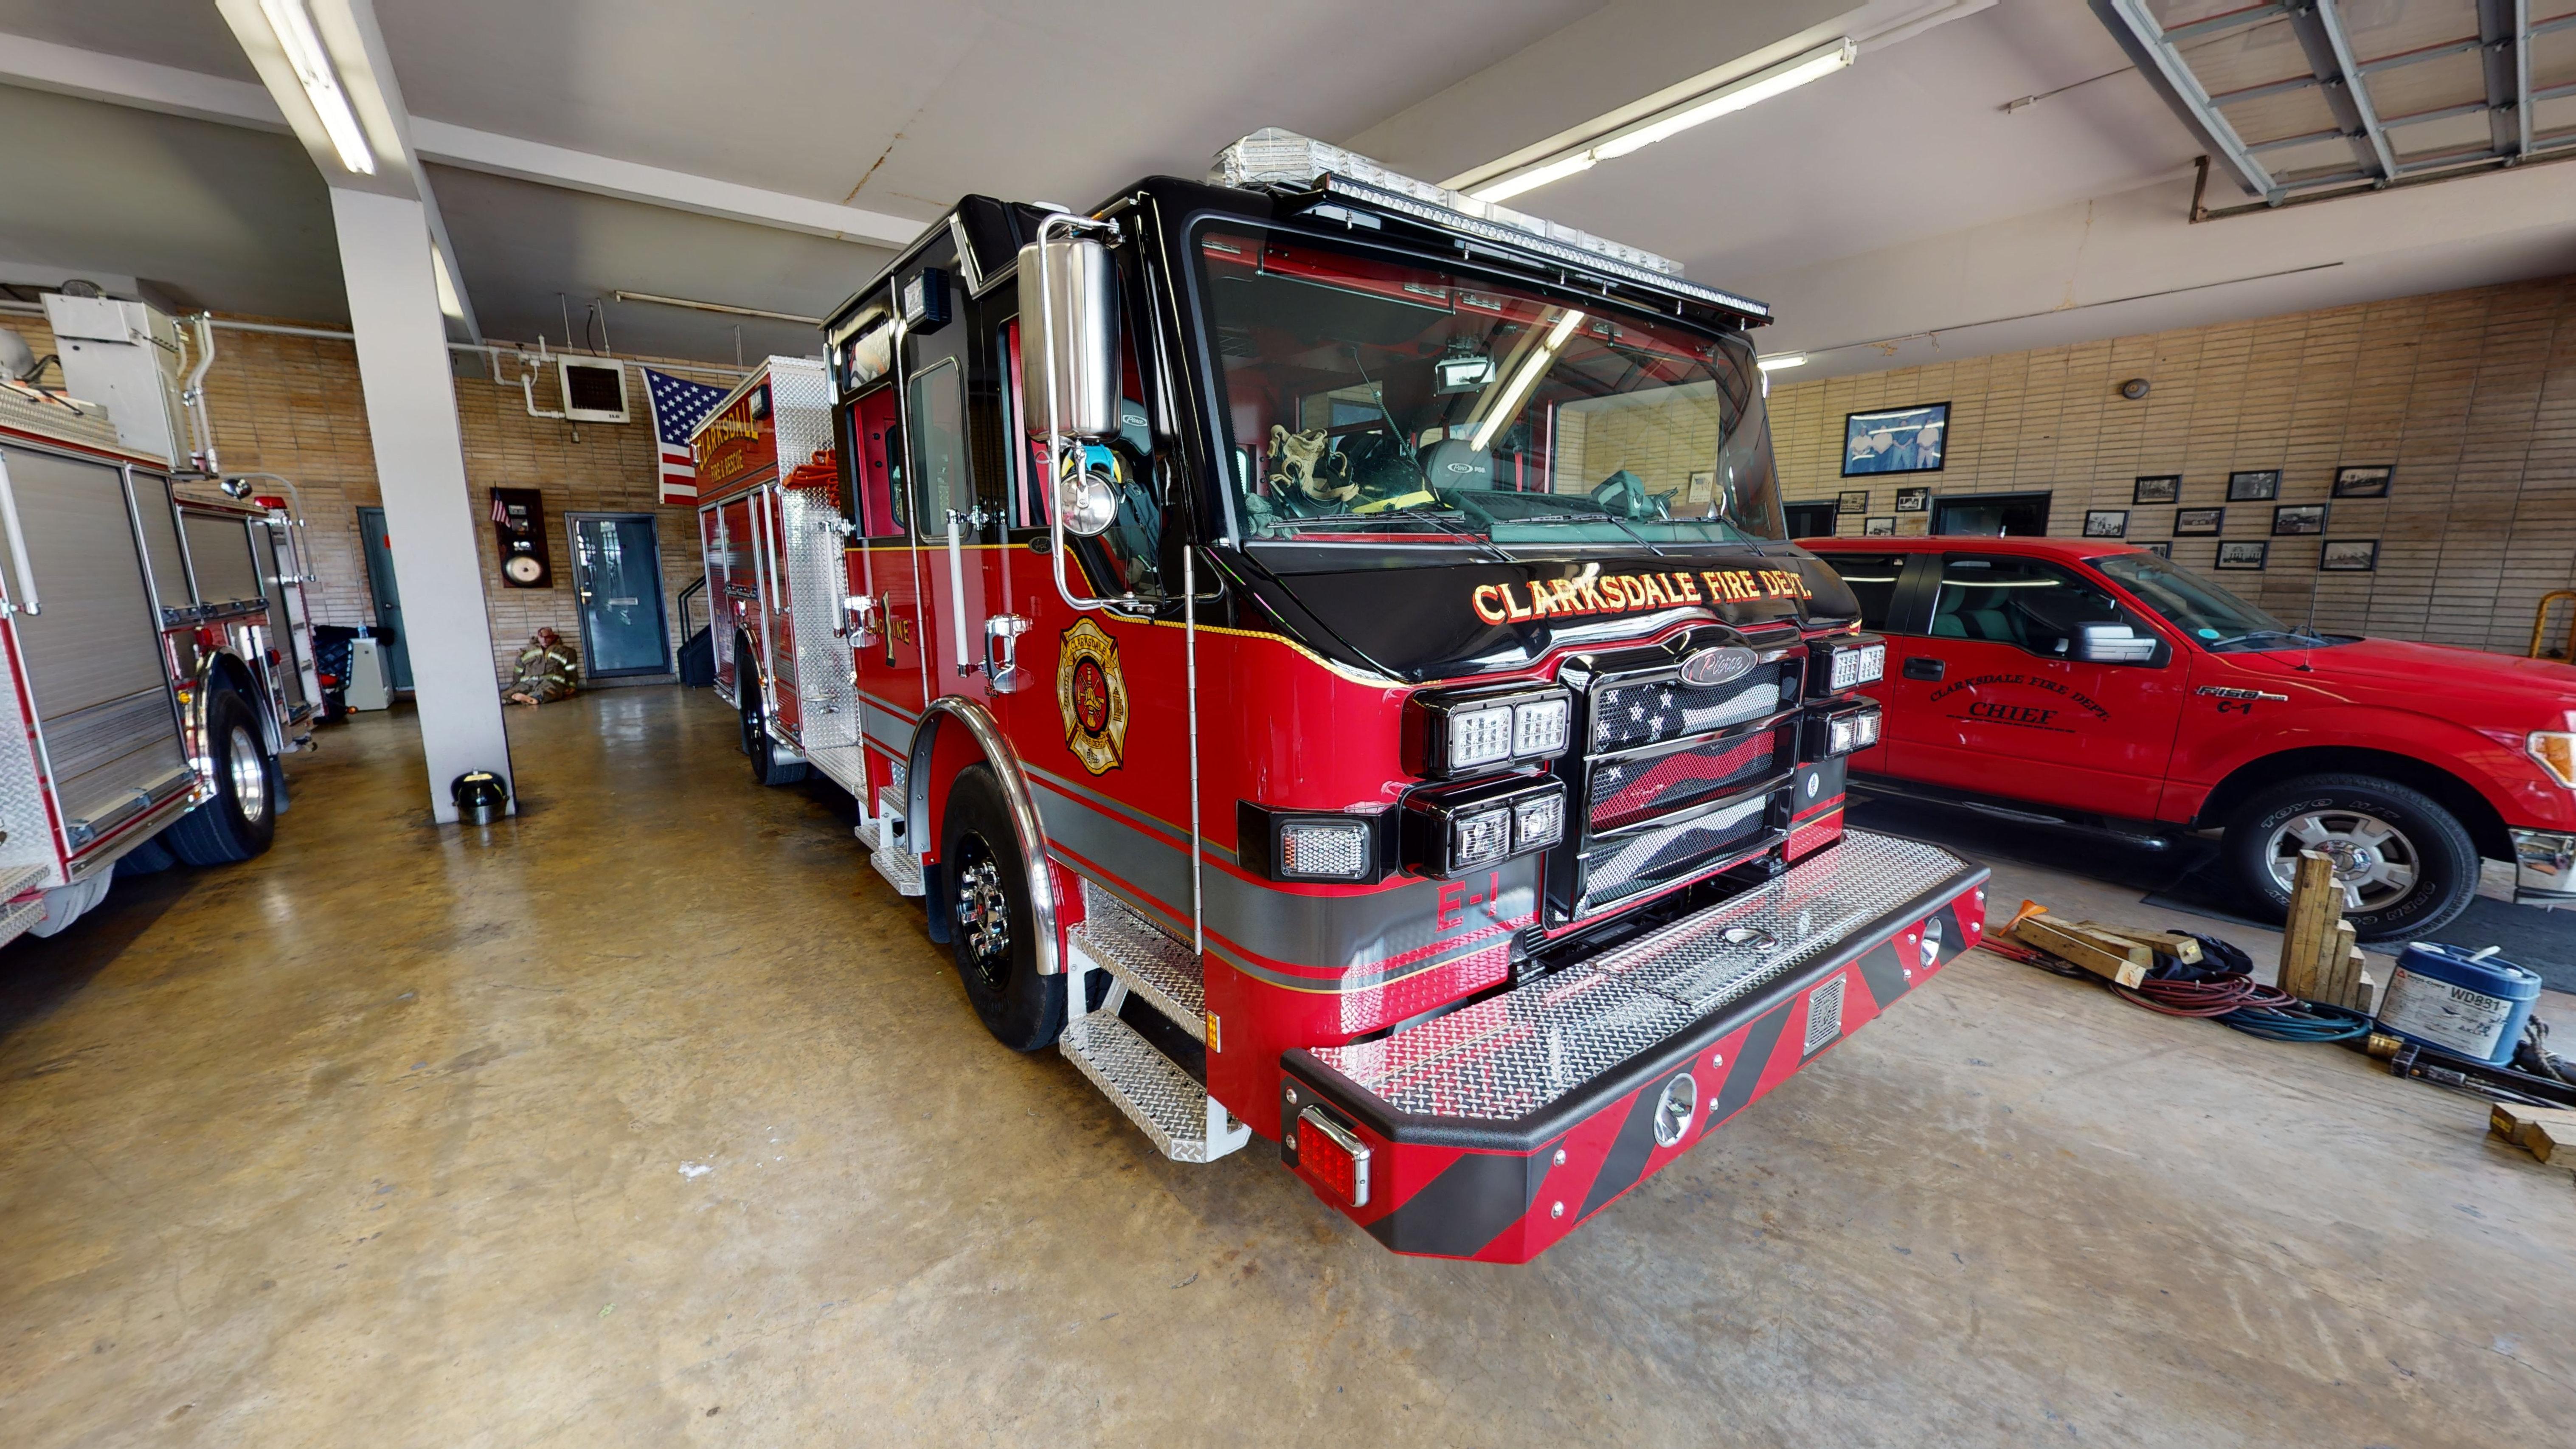 3_Clarksdale-Fire-Dept-06072021_133615